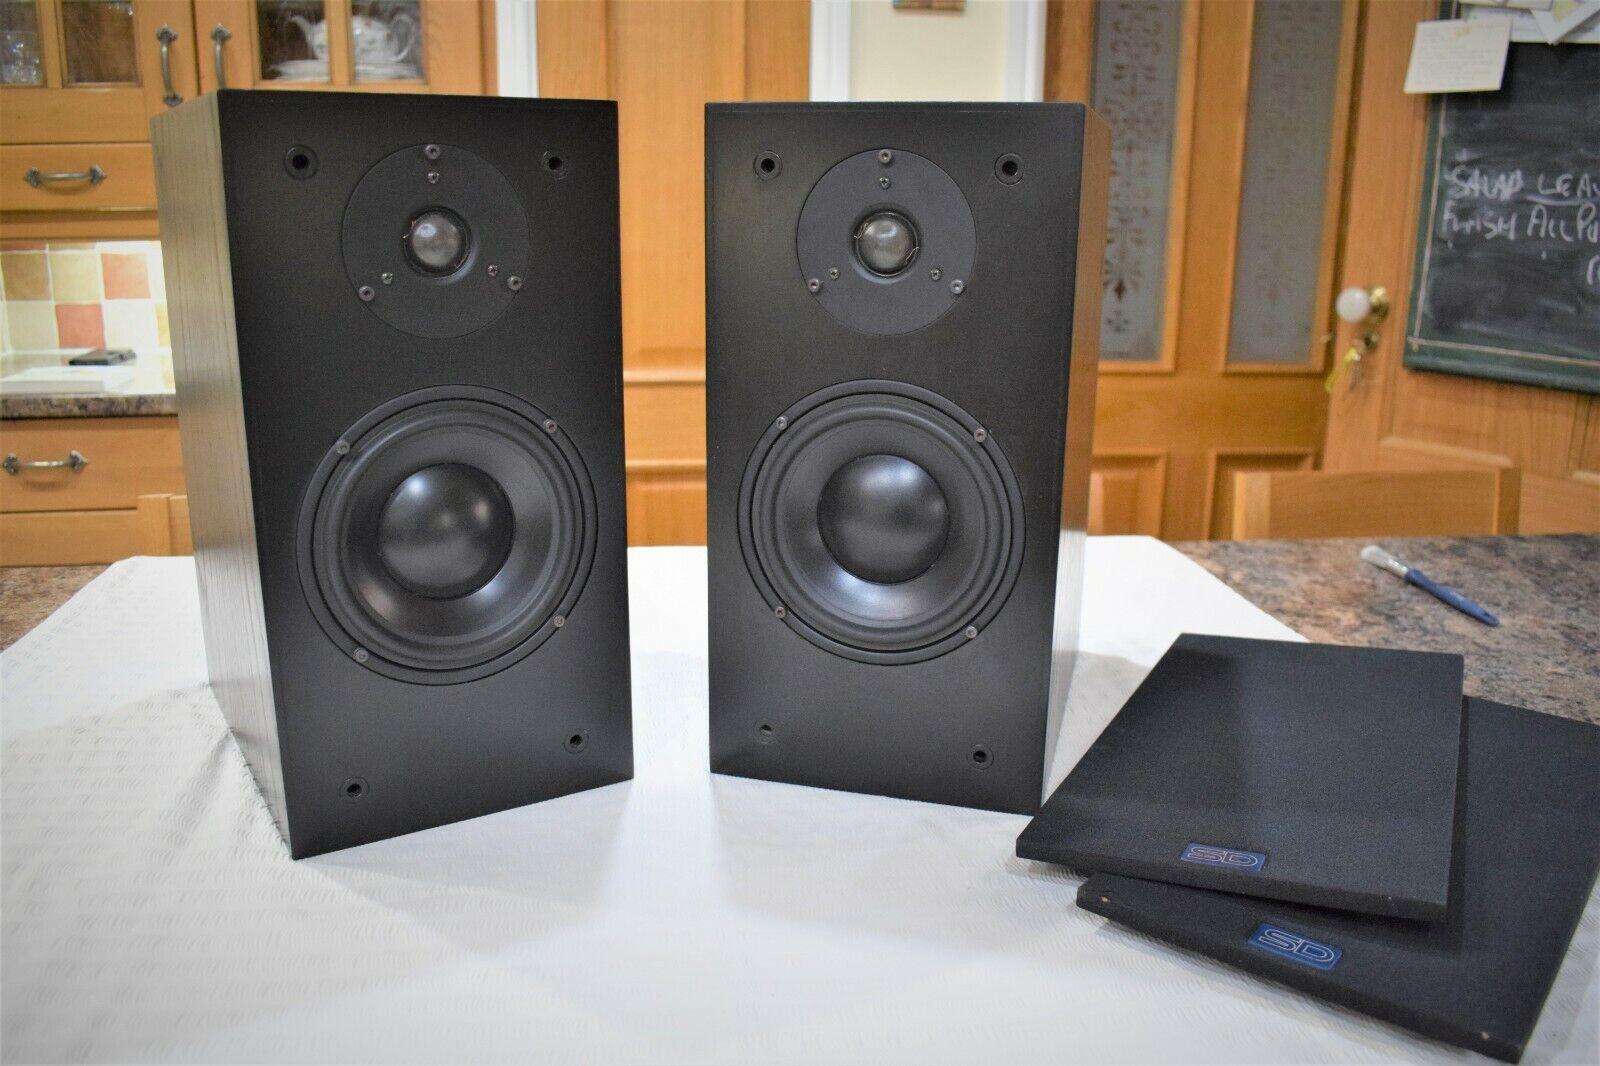 SD ACOUSTICS SD3 MK 2 SPEAKERS - AUDIOPHILE DYNAUDIO